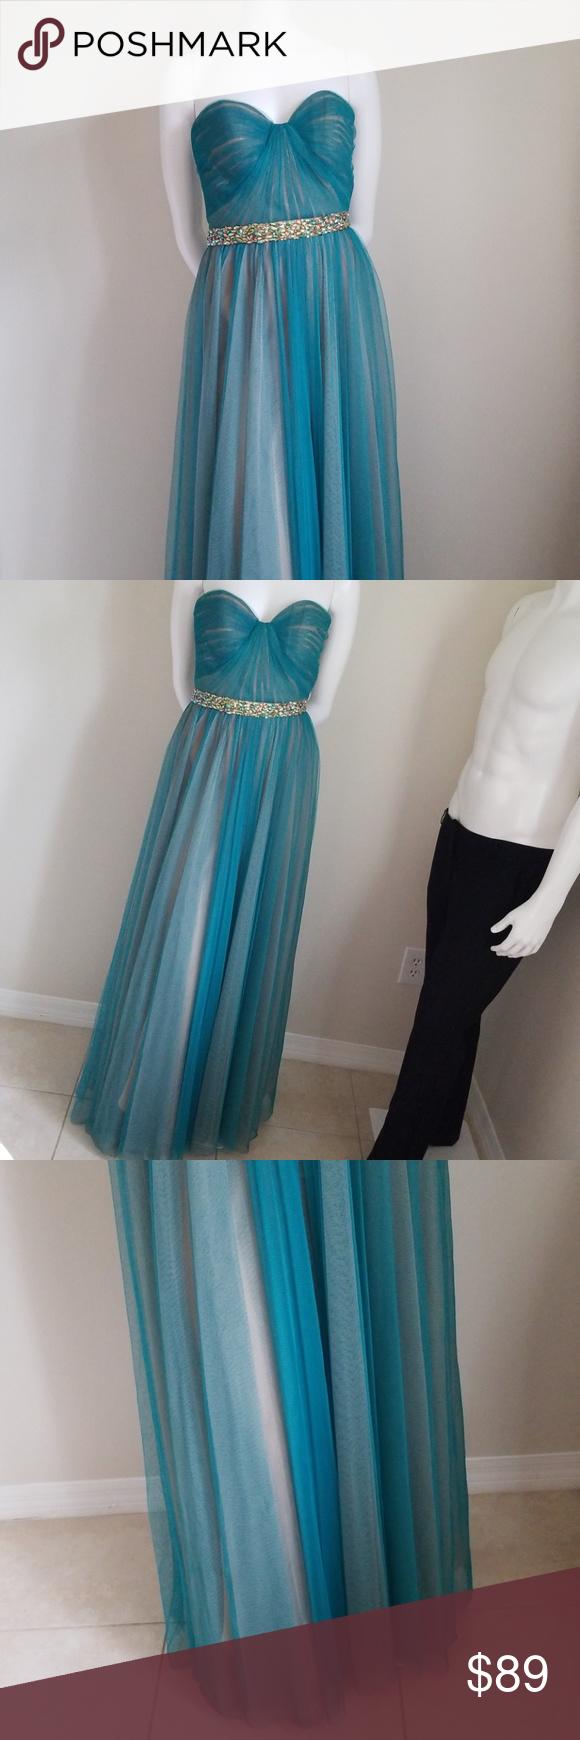 Cache prom dress sweet dress size my posh picks